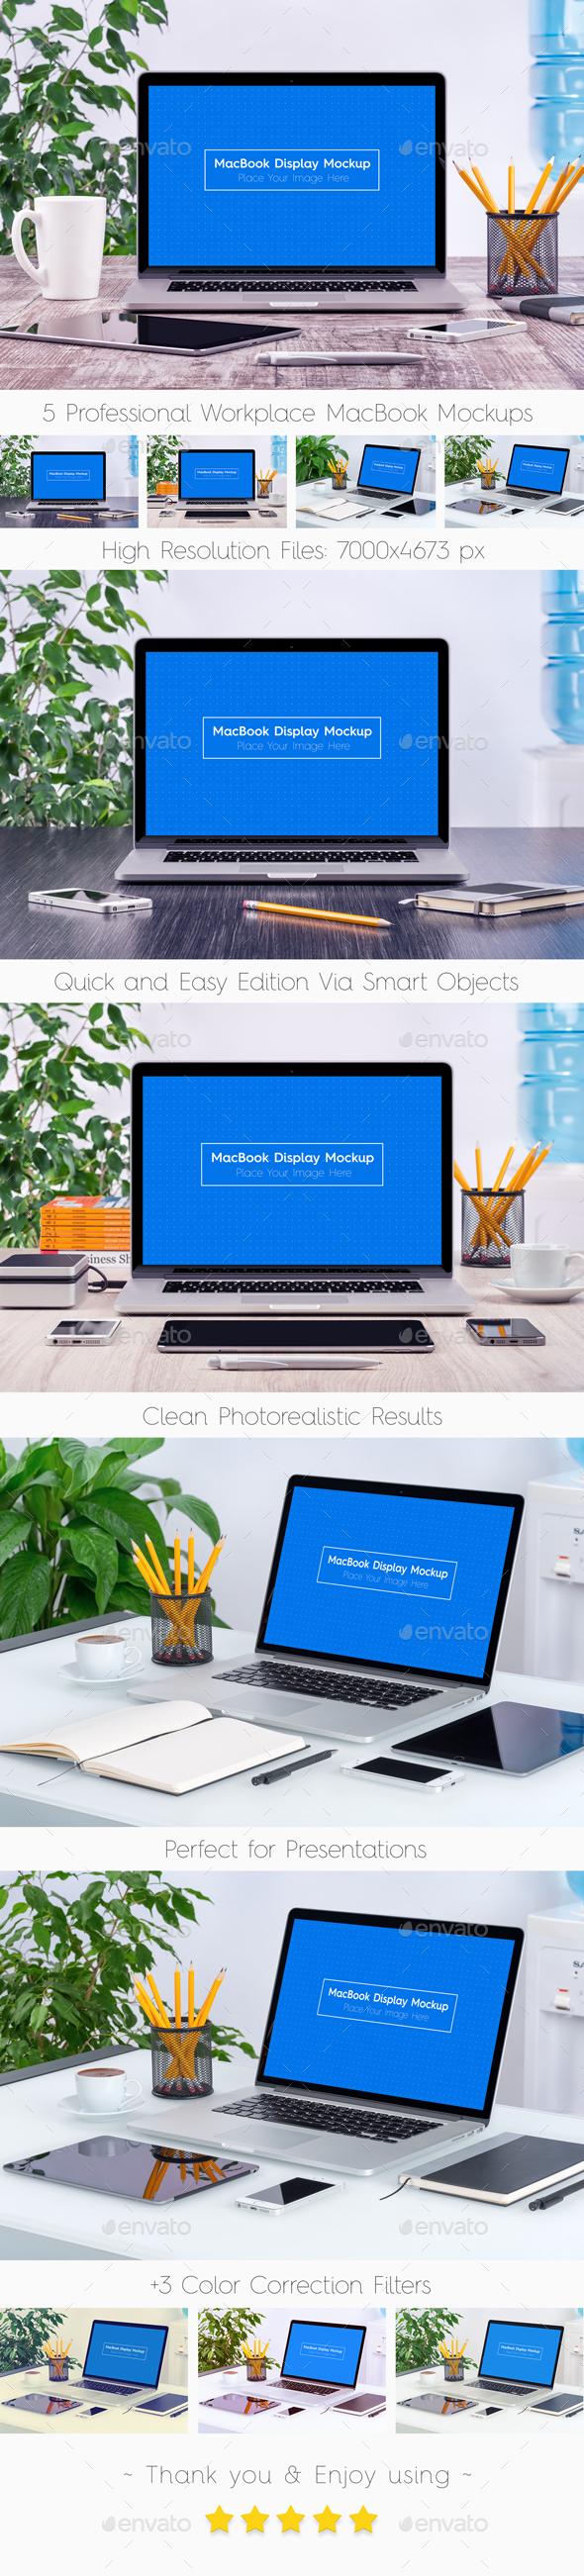 GraphicRiver 5 Workplace MacBook Display Mockups 20331743